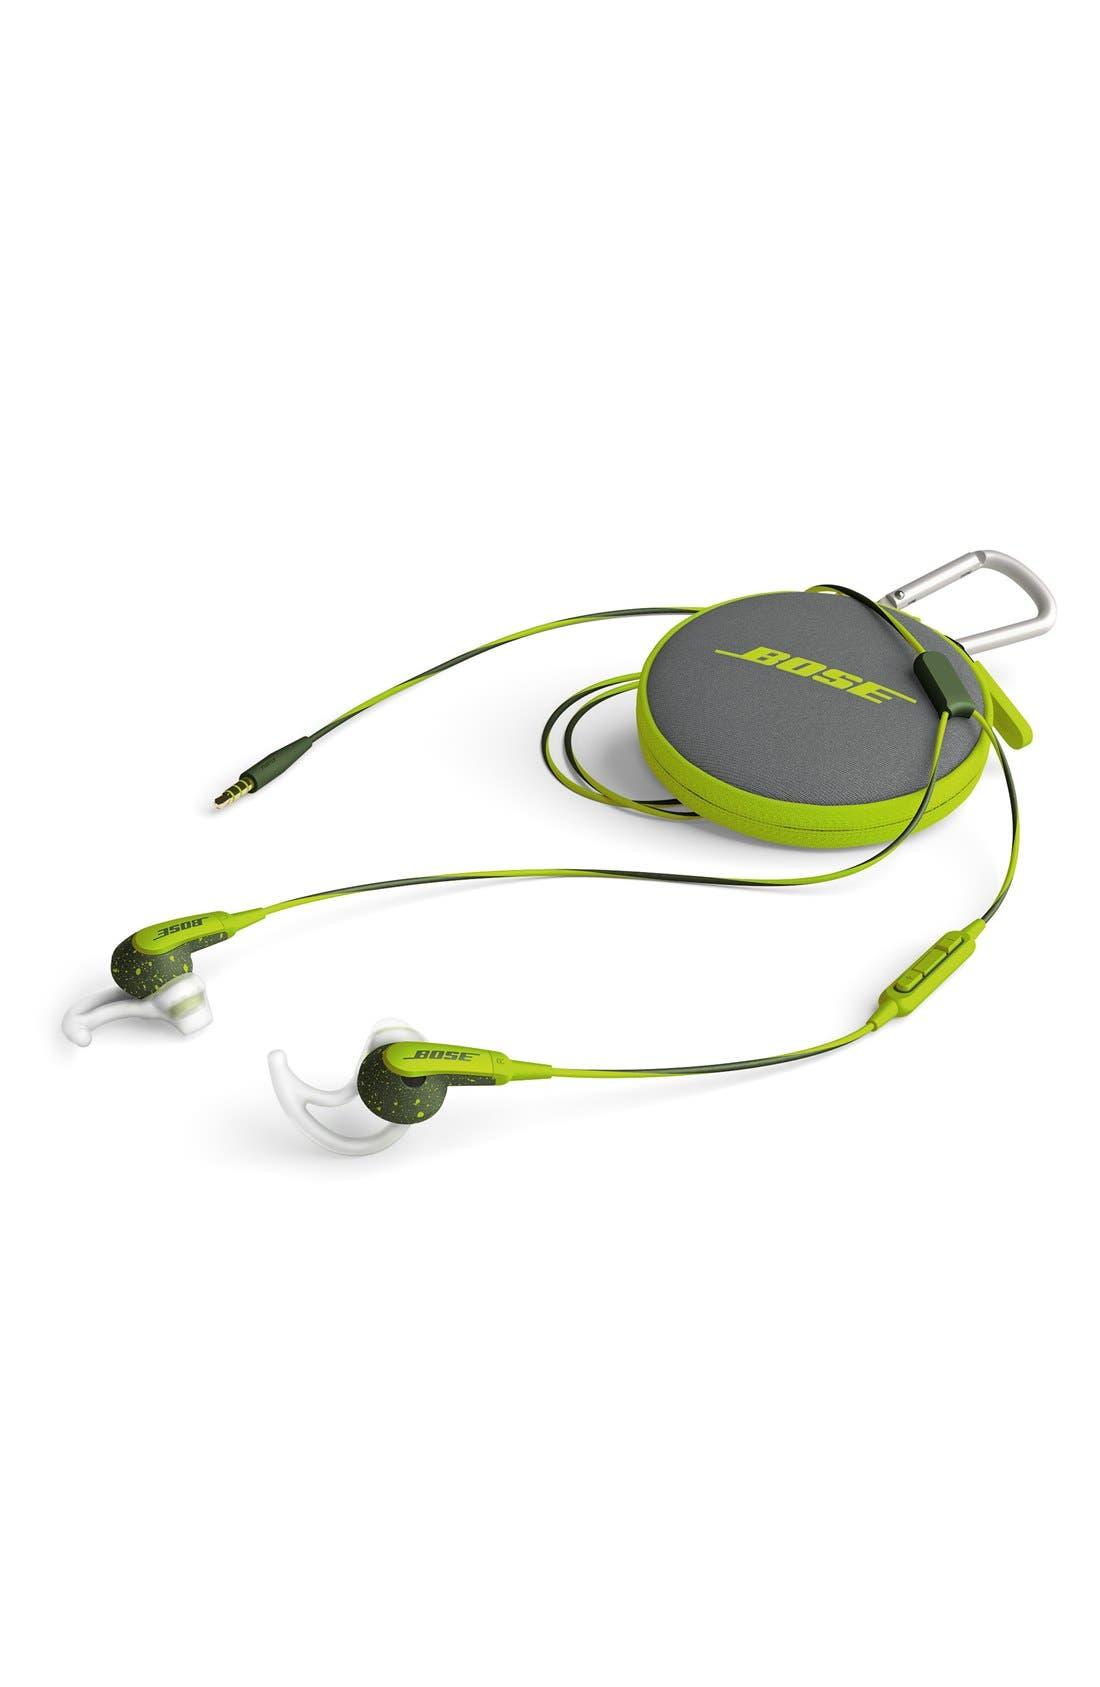 SoundSport<sup>®</sup> In-Ear Headphones,                             Alternate thumbnail 6, color,                             300